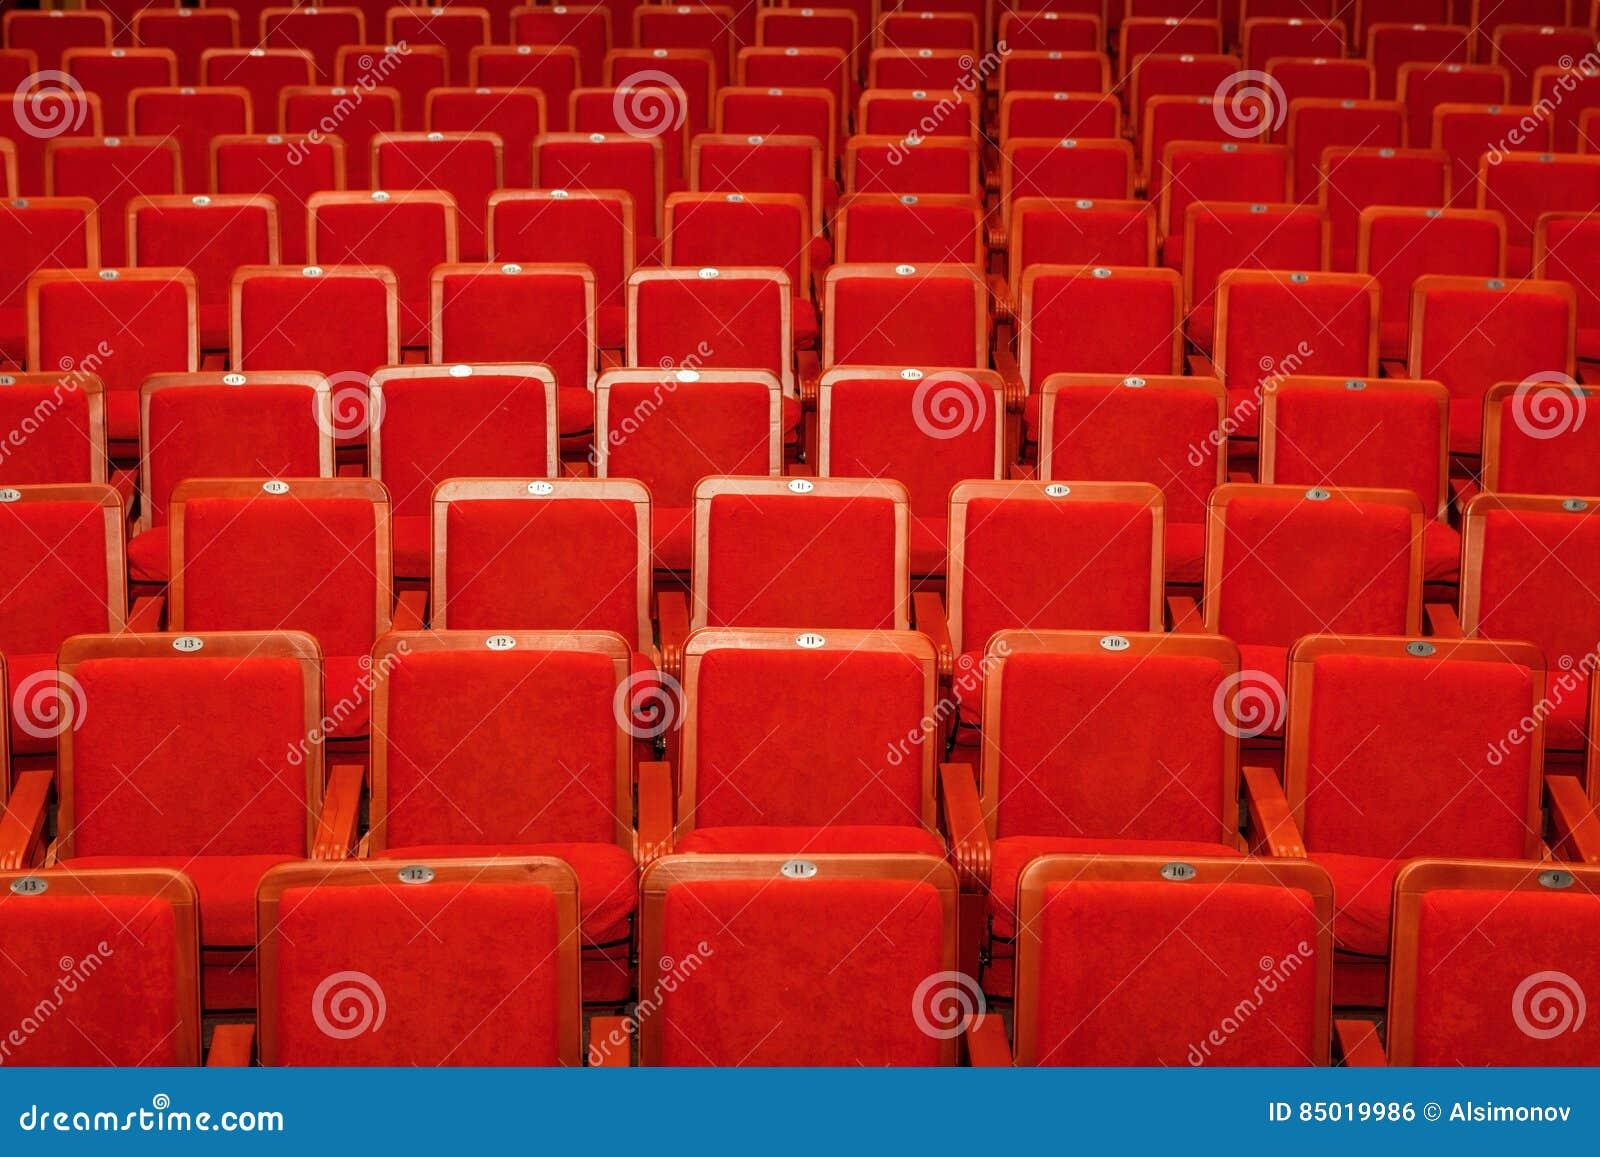 Teatro Le Sedie.Sedie Rosse Per Il Pubblico Nel Cinema O Nel Teatro